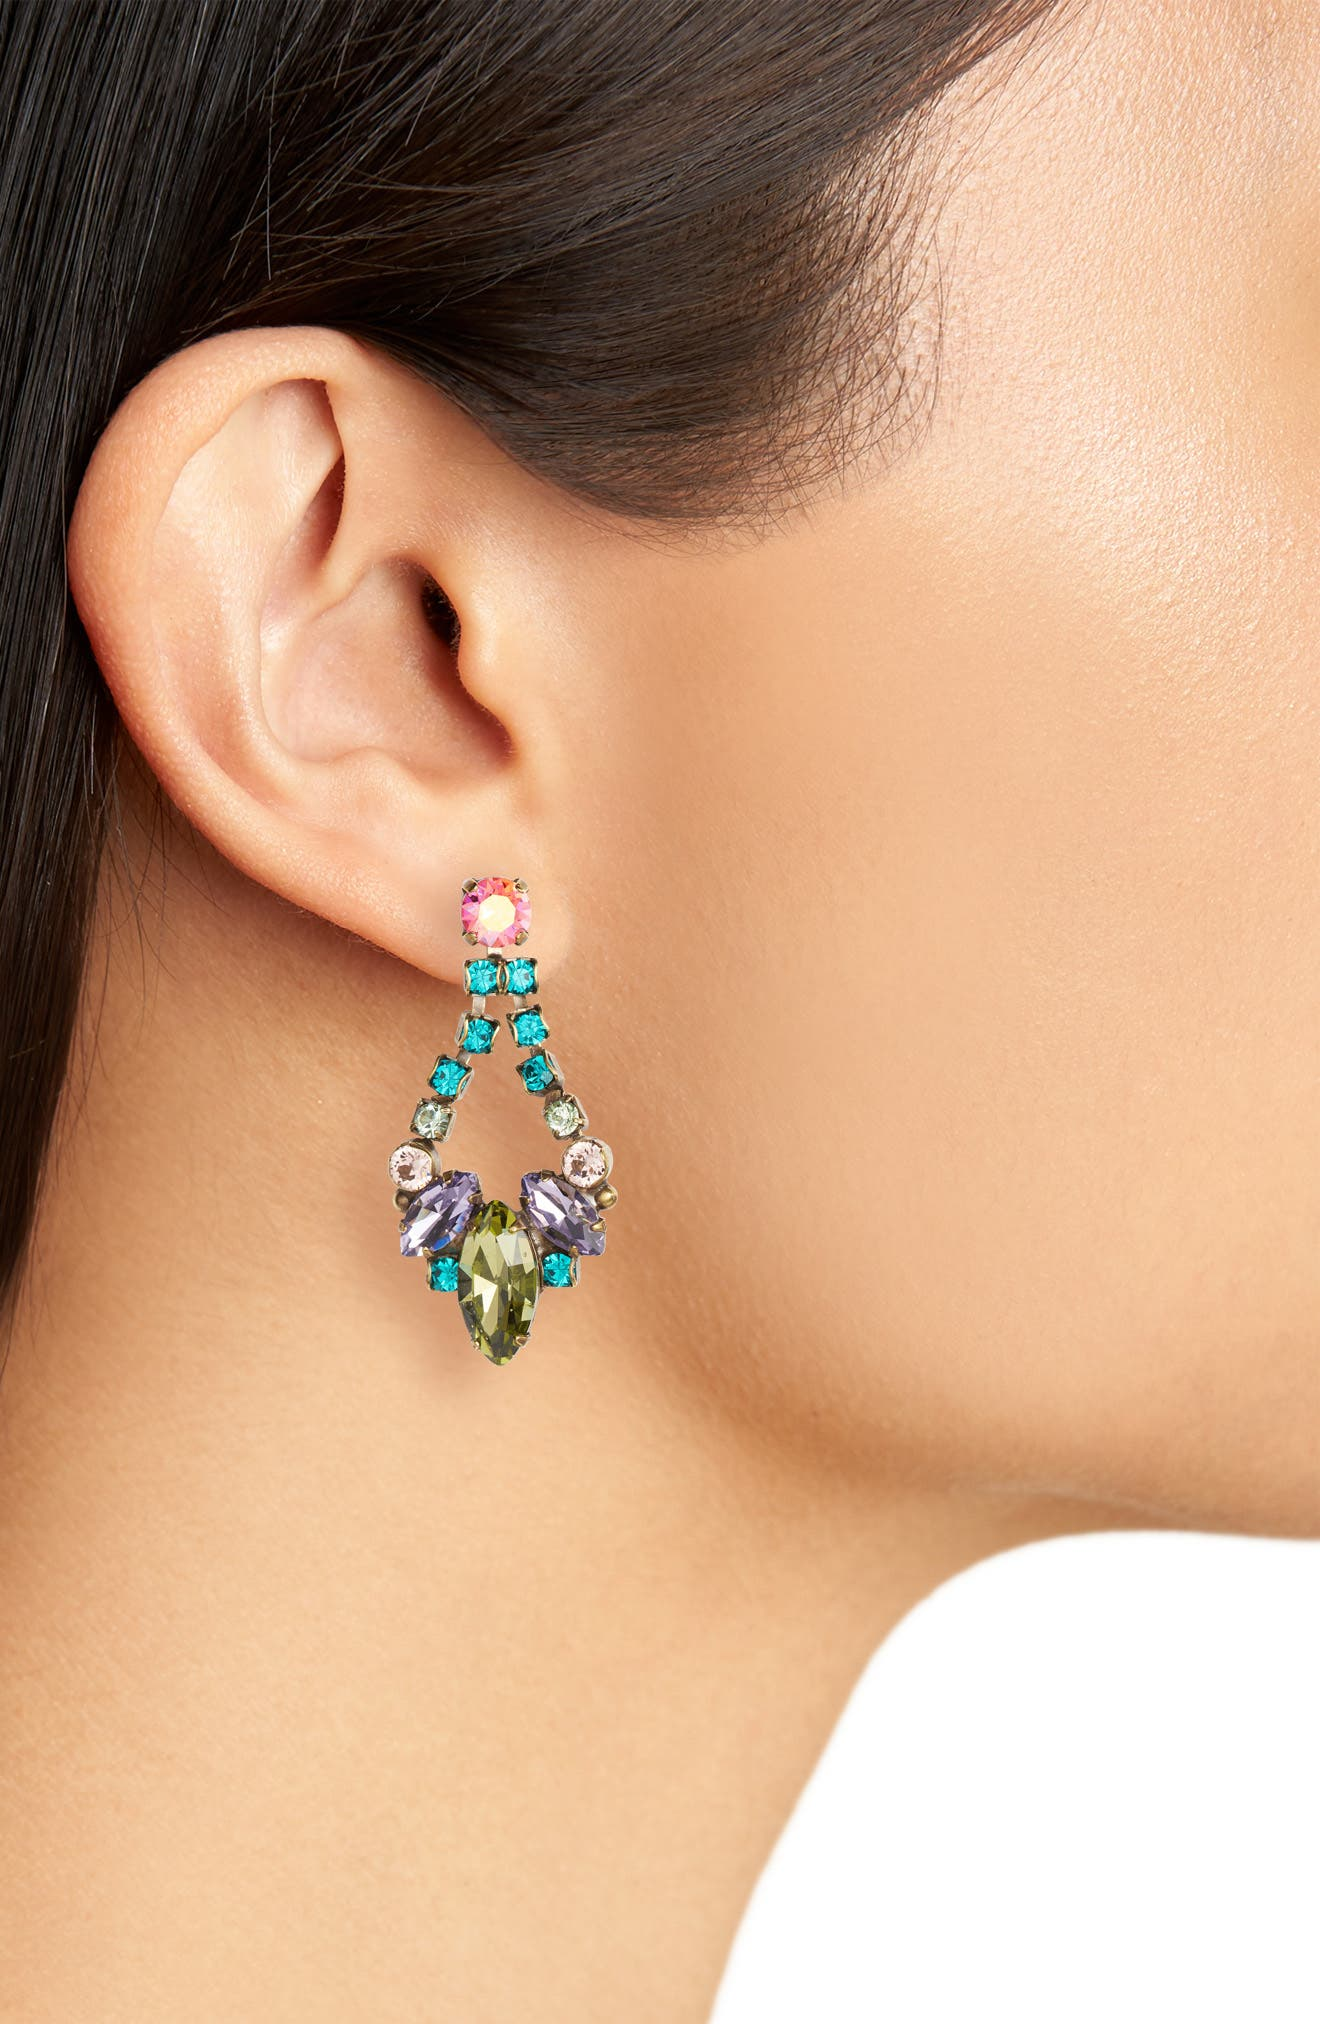 Noveau Navette Crystal Drop Earrings,                             Alternate thumbnail 2, color,                             GREEN MULTI